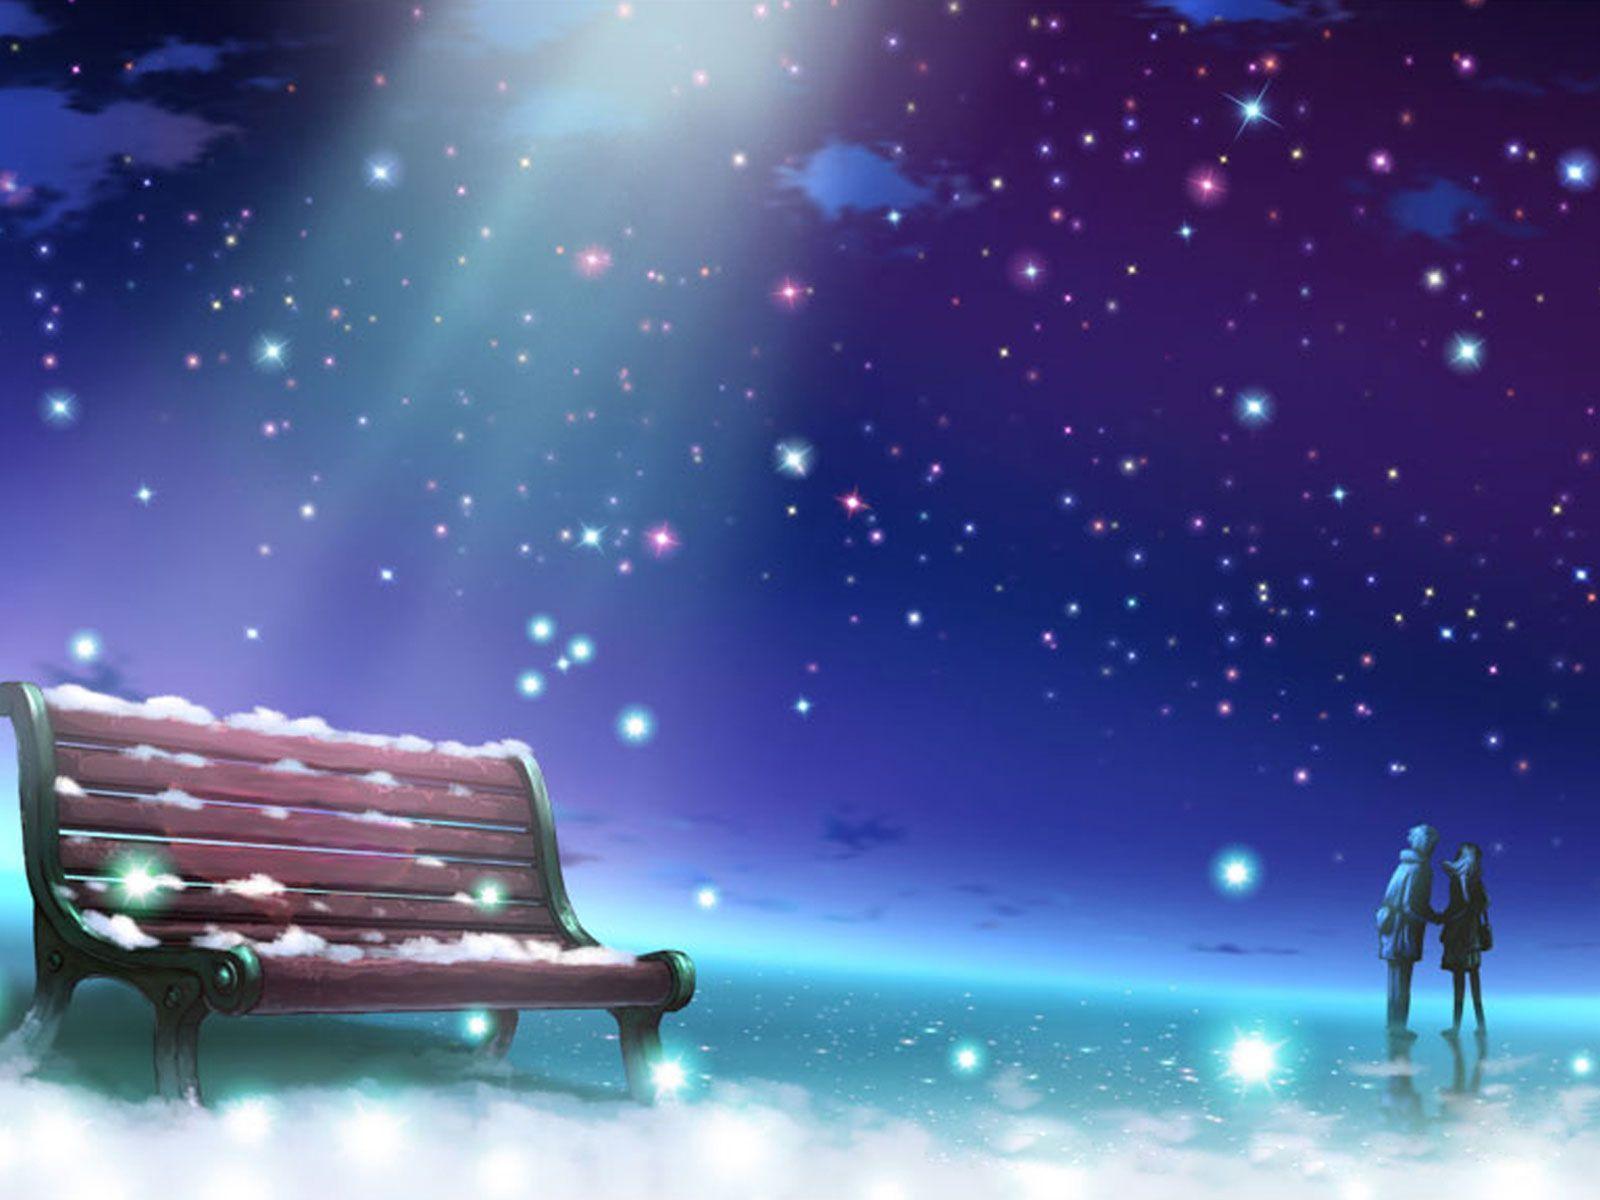 Wallpaper cartoon Anime Love : Romantic Anime Wallpapers - Wallpaper cave